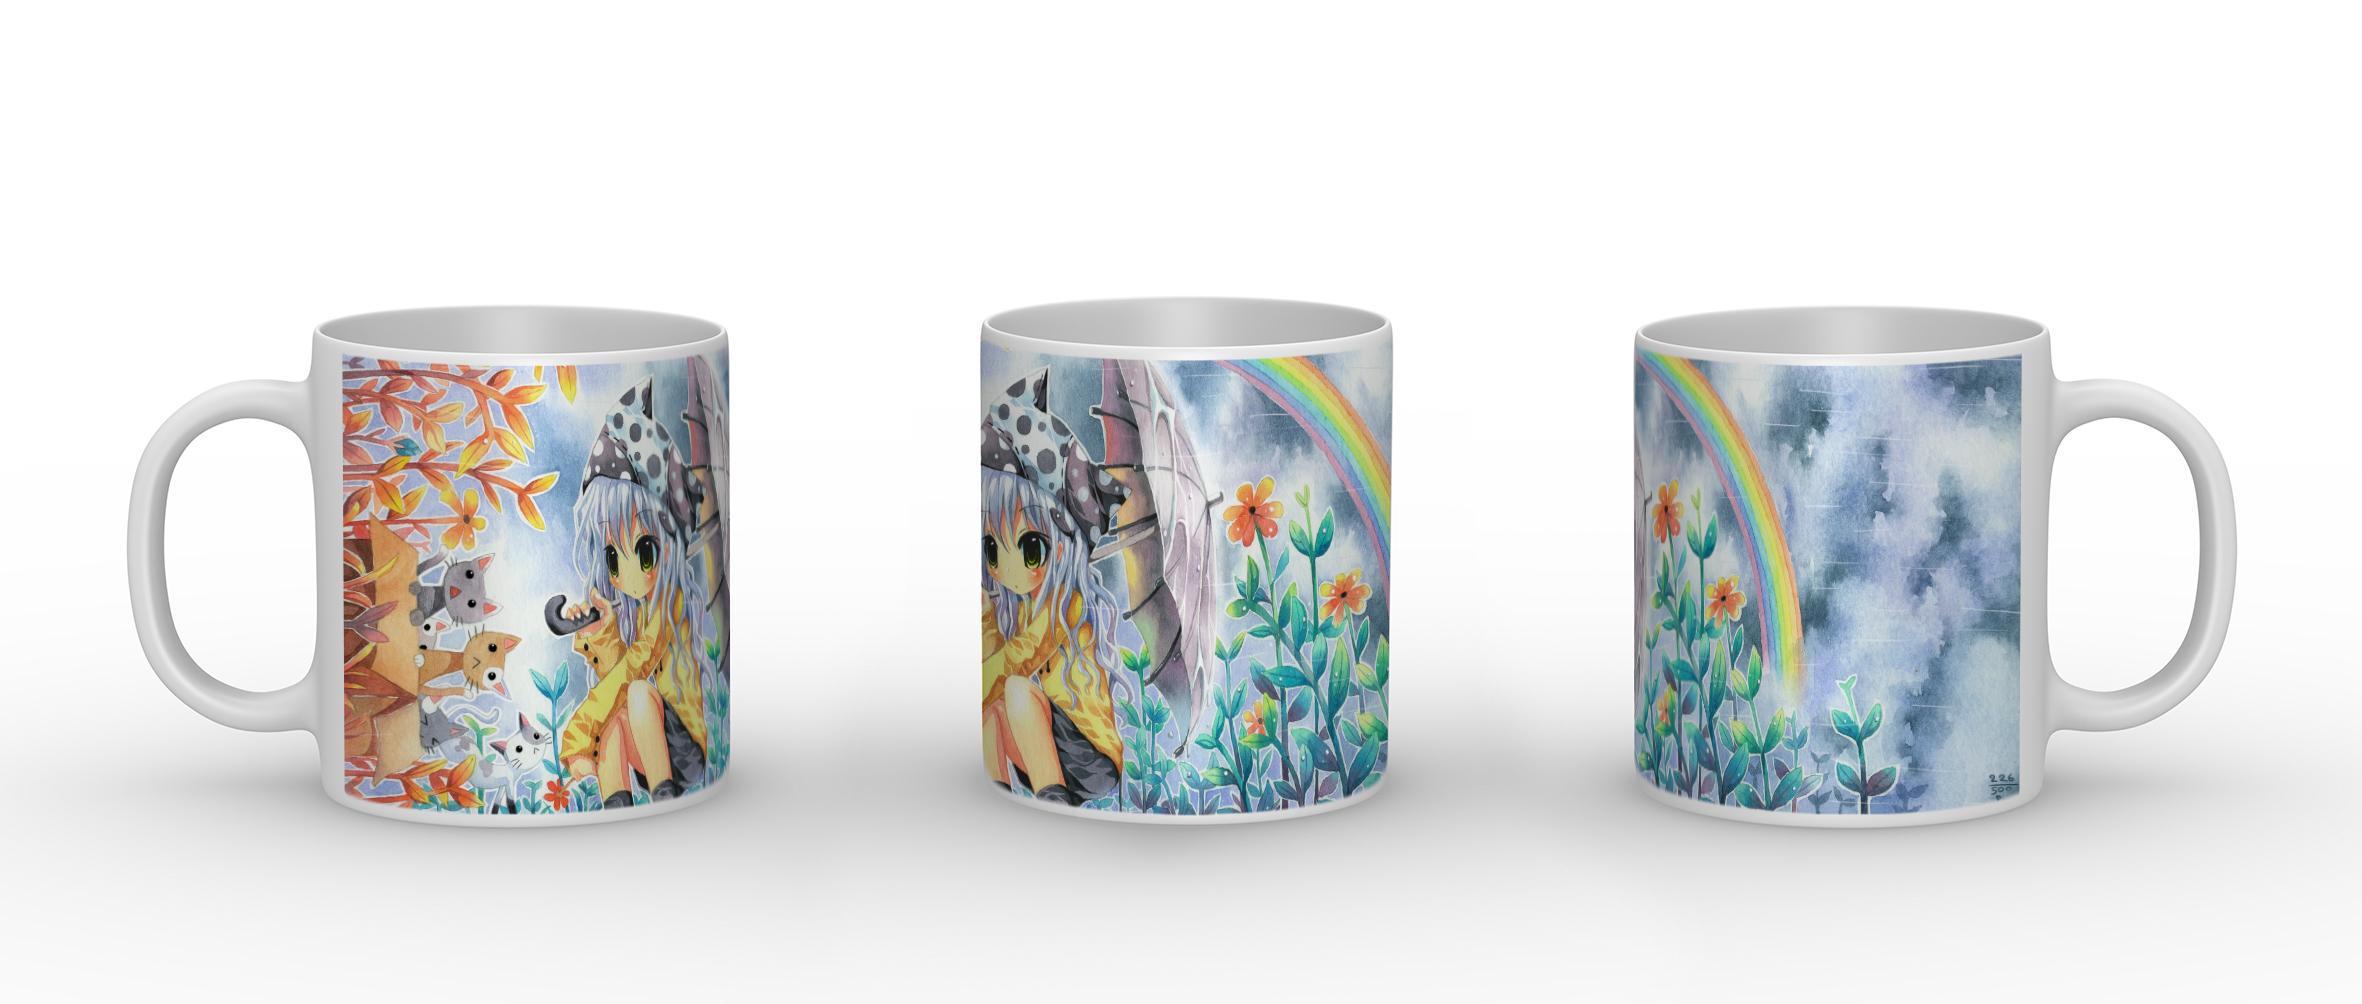 Rainbow Girl - Porzellan Tasse mit Panorama Motiv